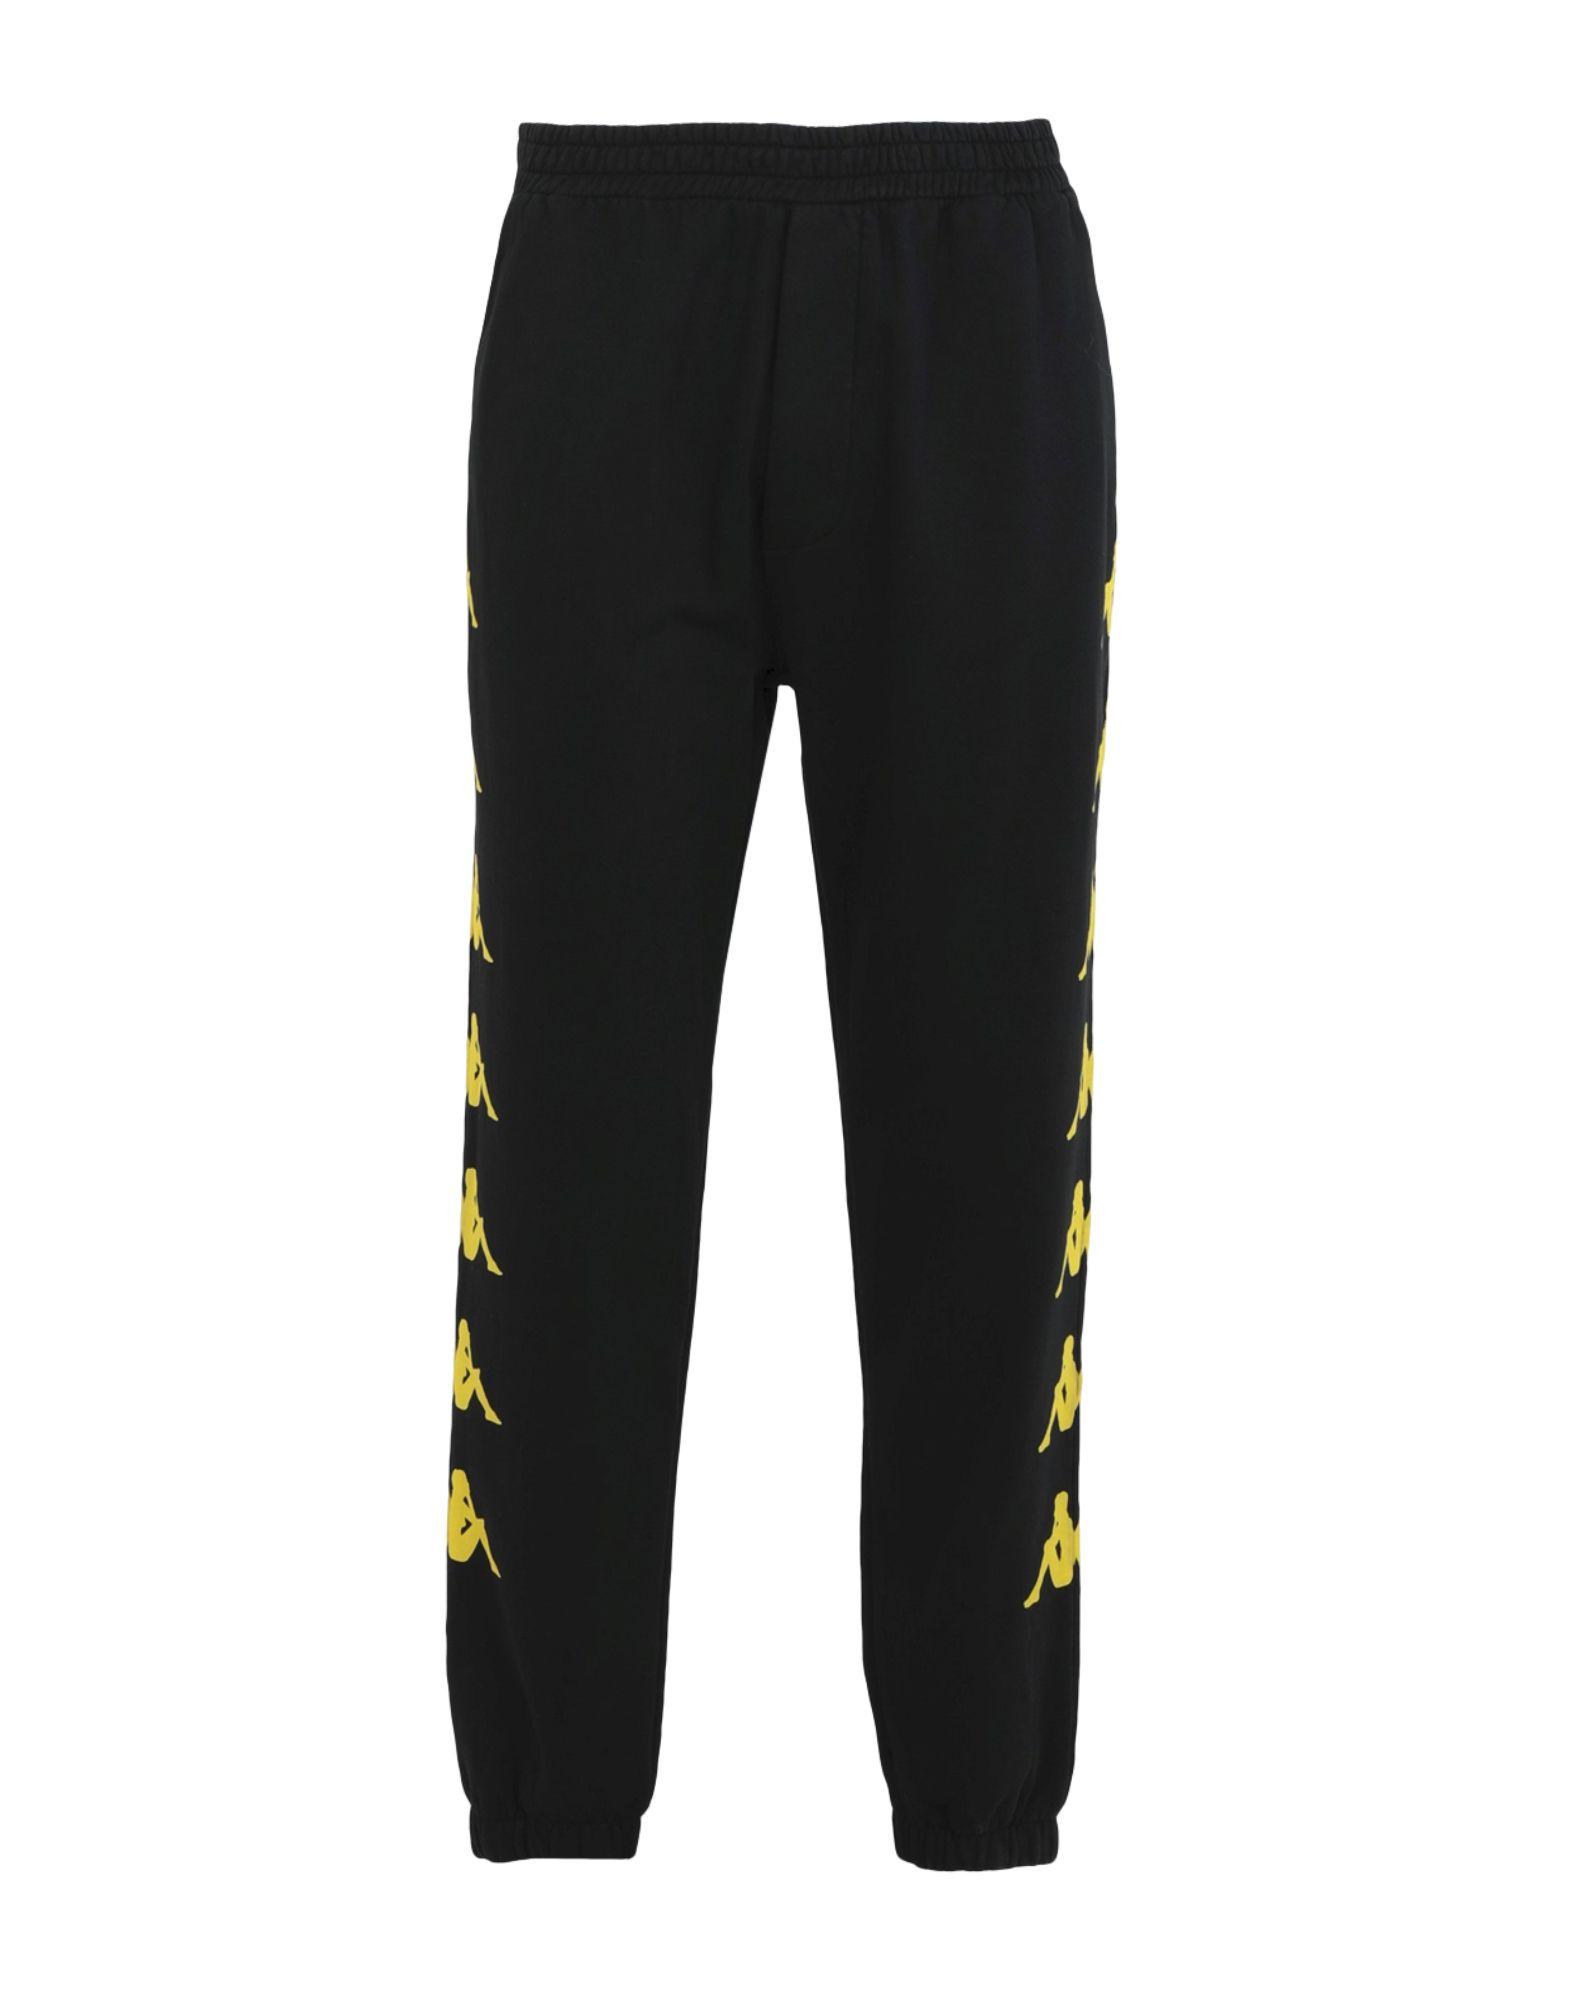 Pantalone Danilo Paura X Kappa Kappa uomo - 13248929KB  Online-Verkauf sparen Sie 70%